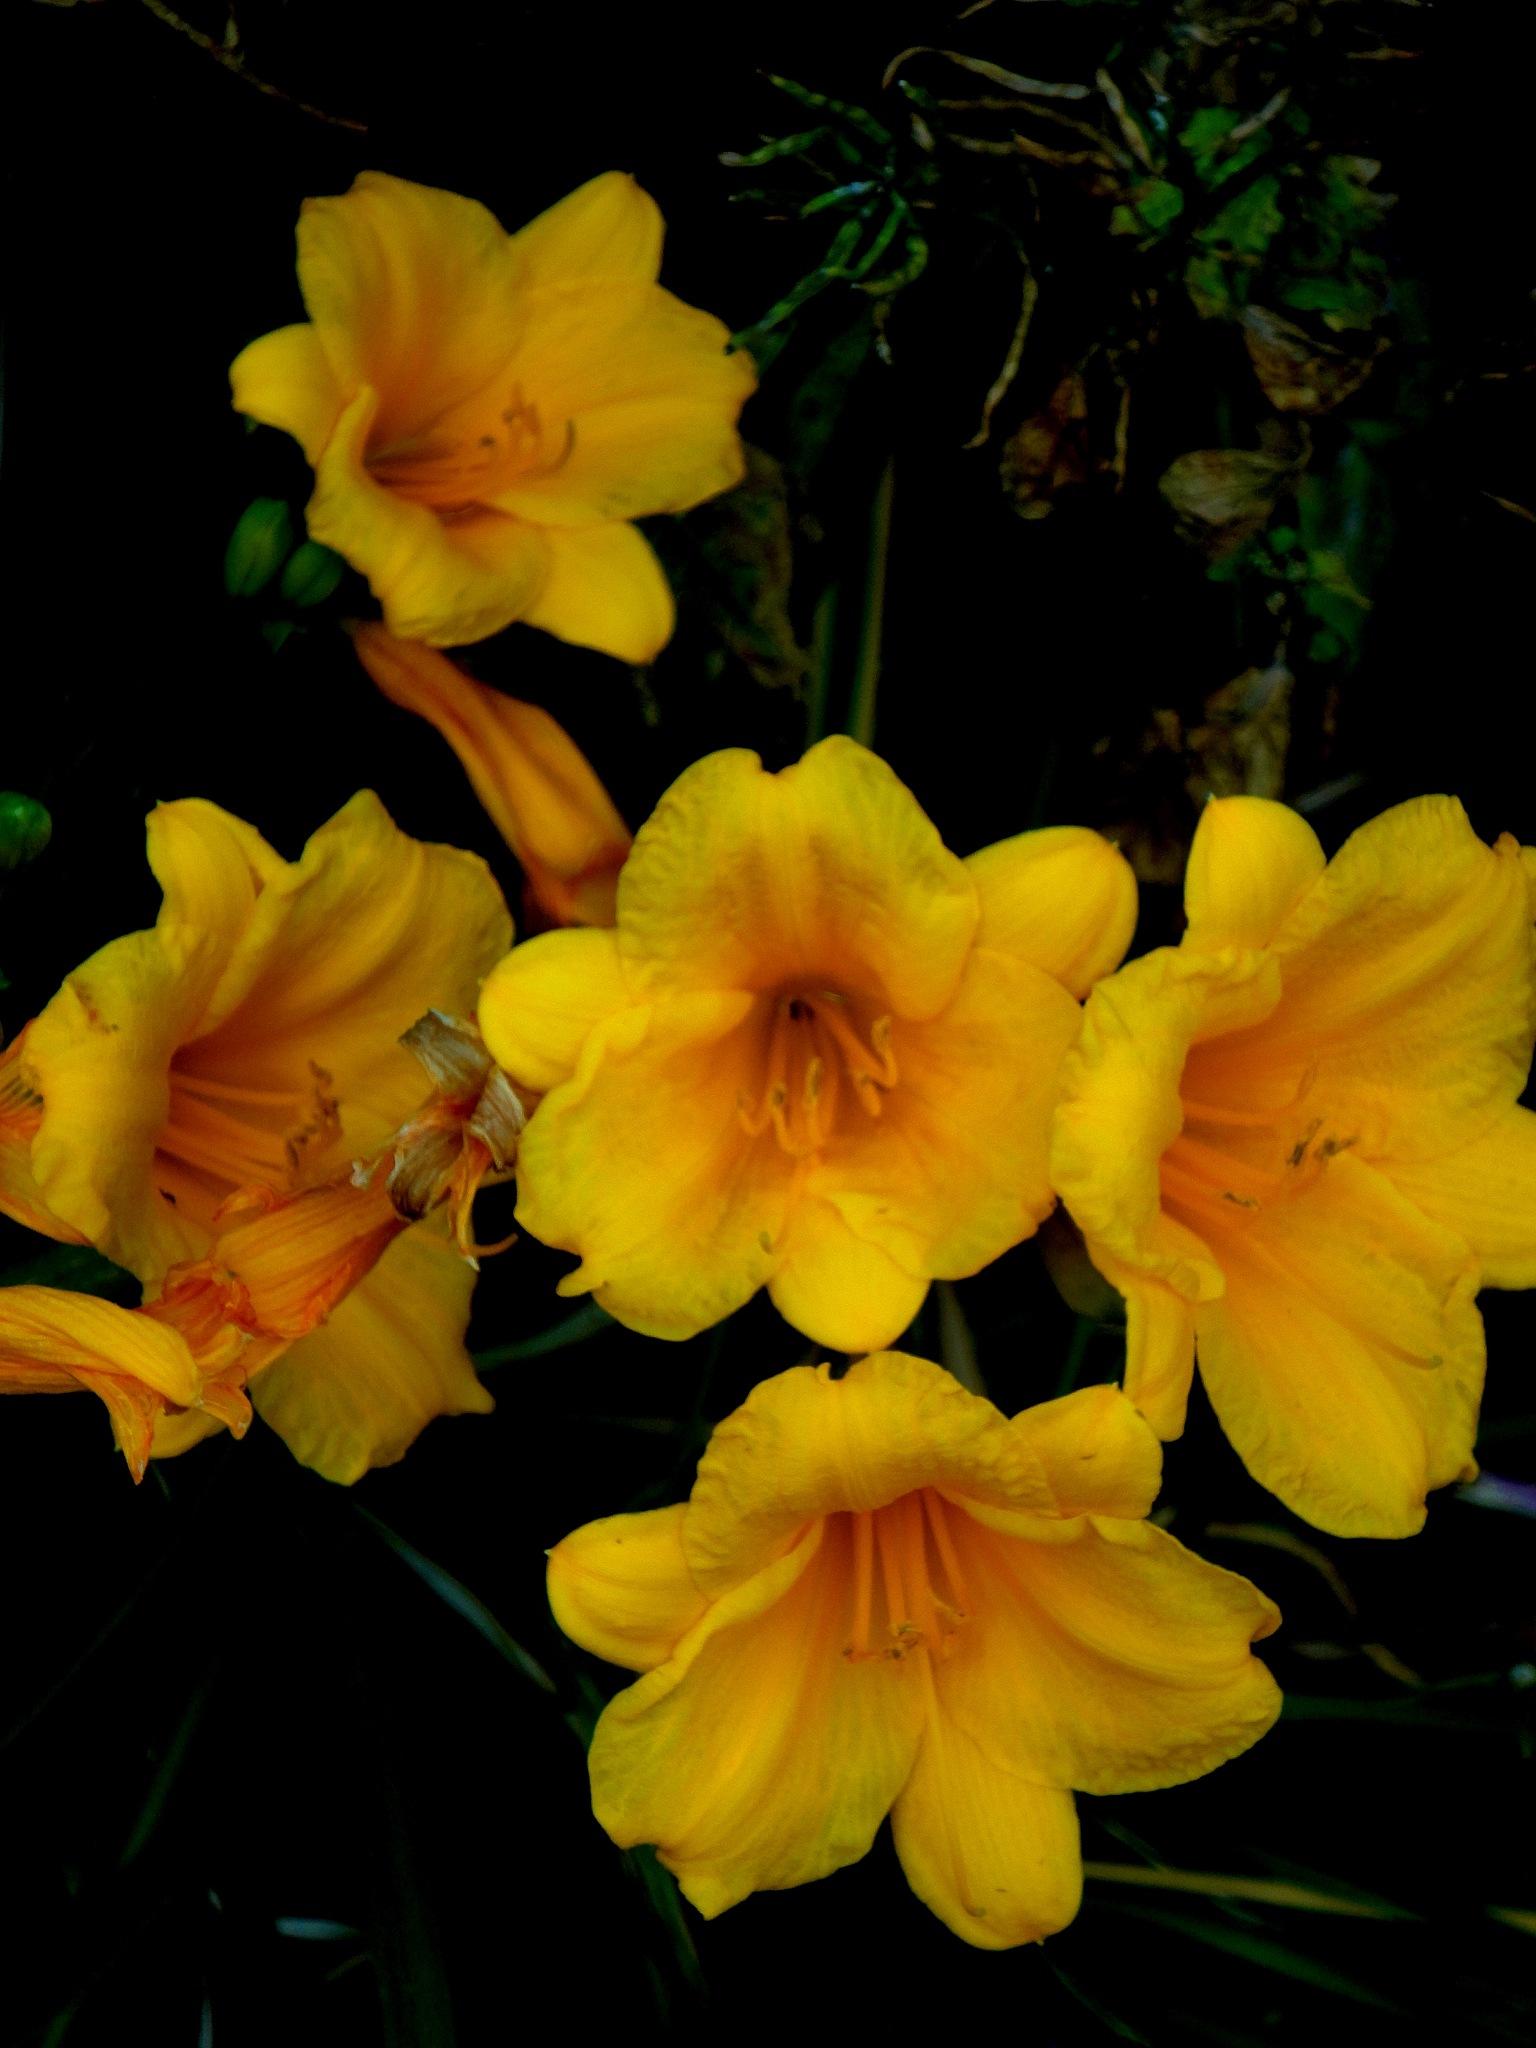 yellow flowers by nancy.mitchell3